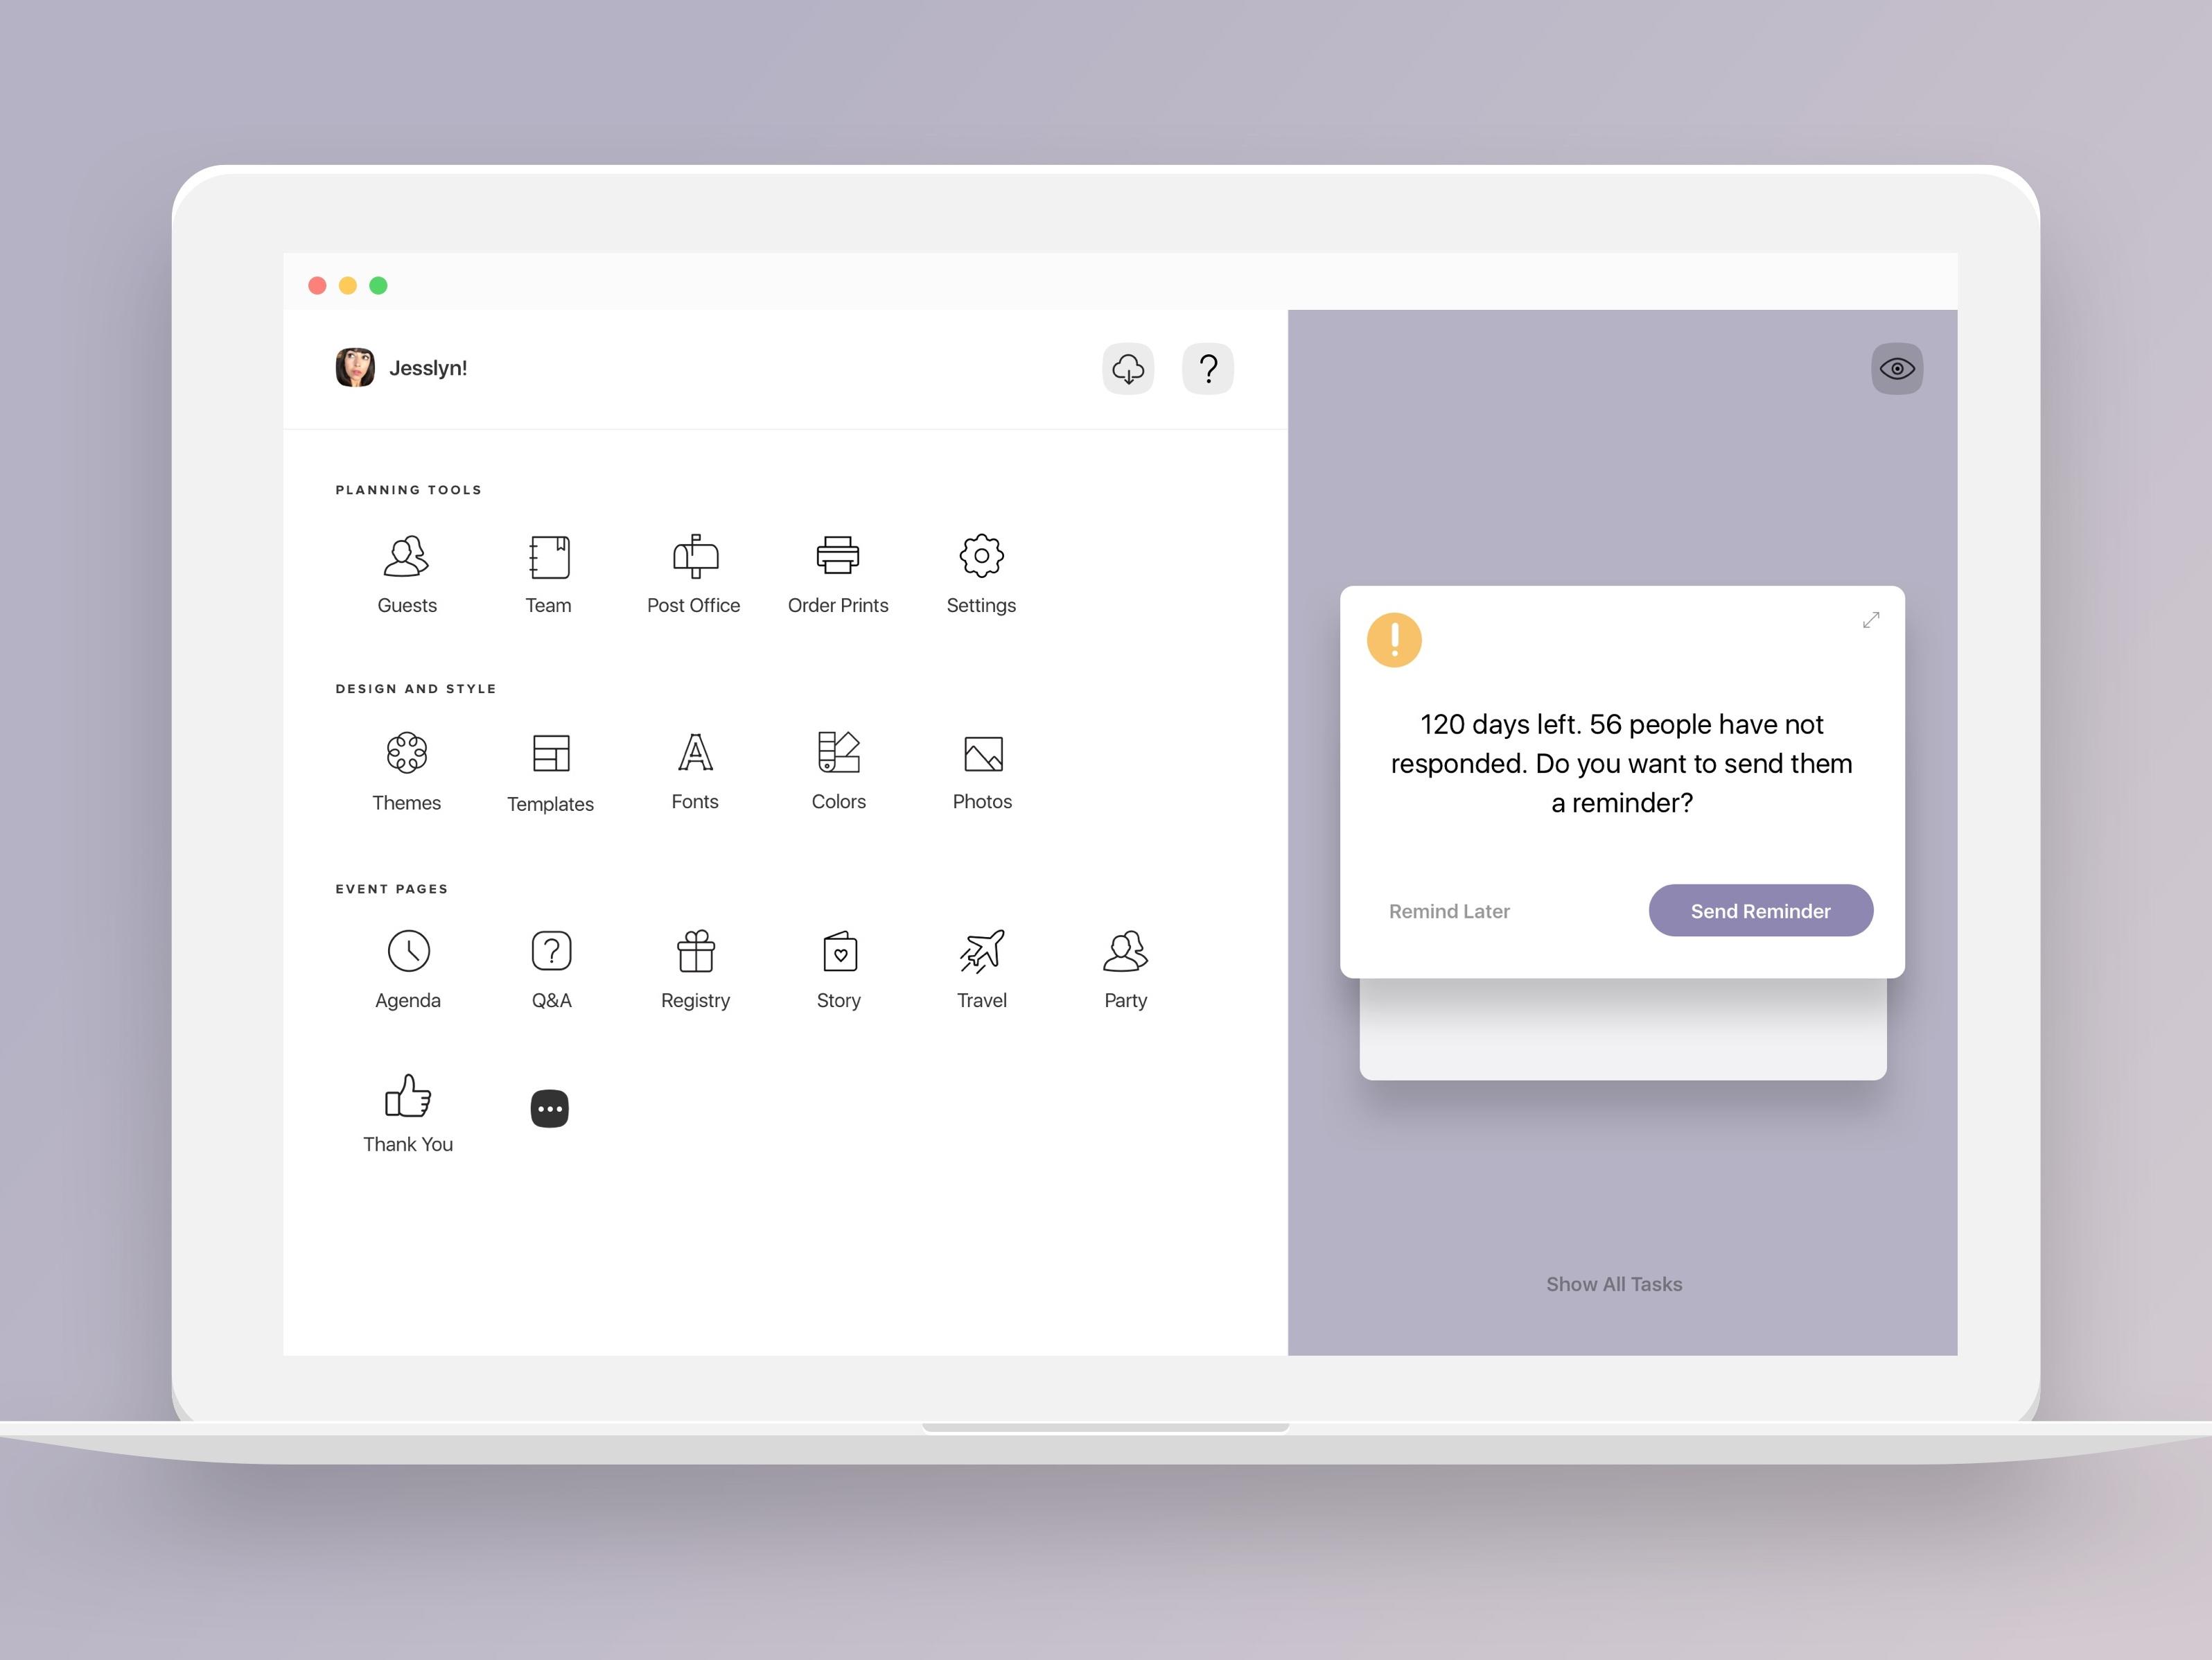 Dribbble  Joyherodesktop By Joy in Desktop Reminder Gadget